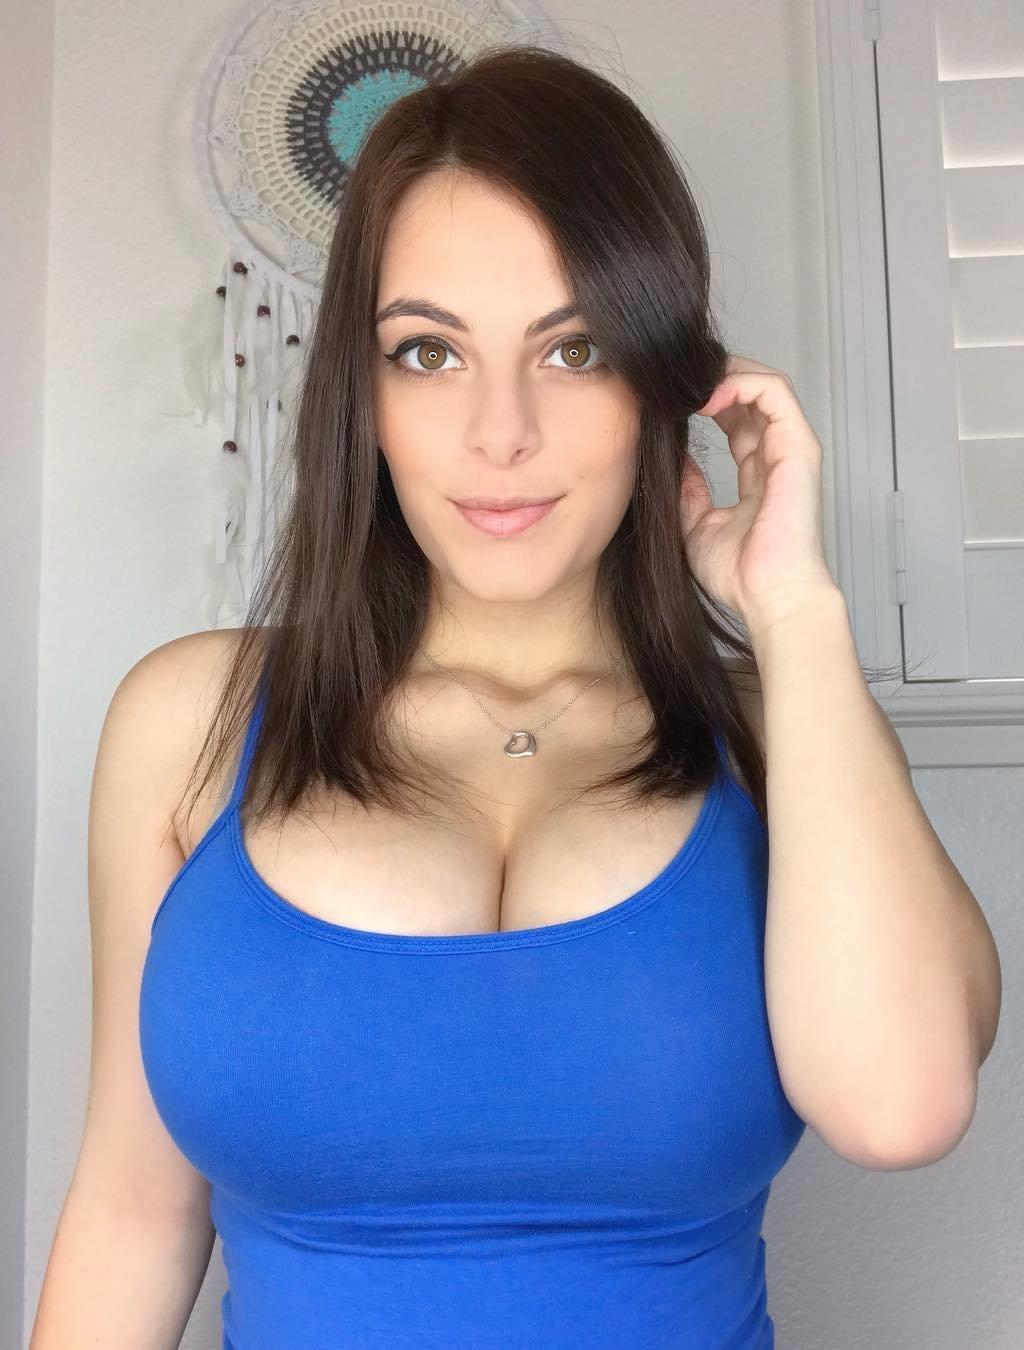 Yo tittyfuck, naked nerd girl threesome